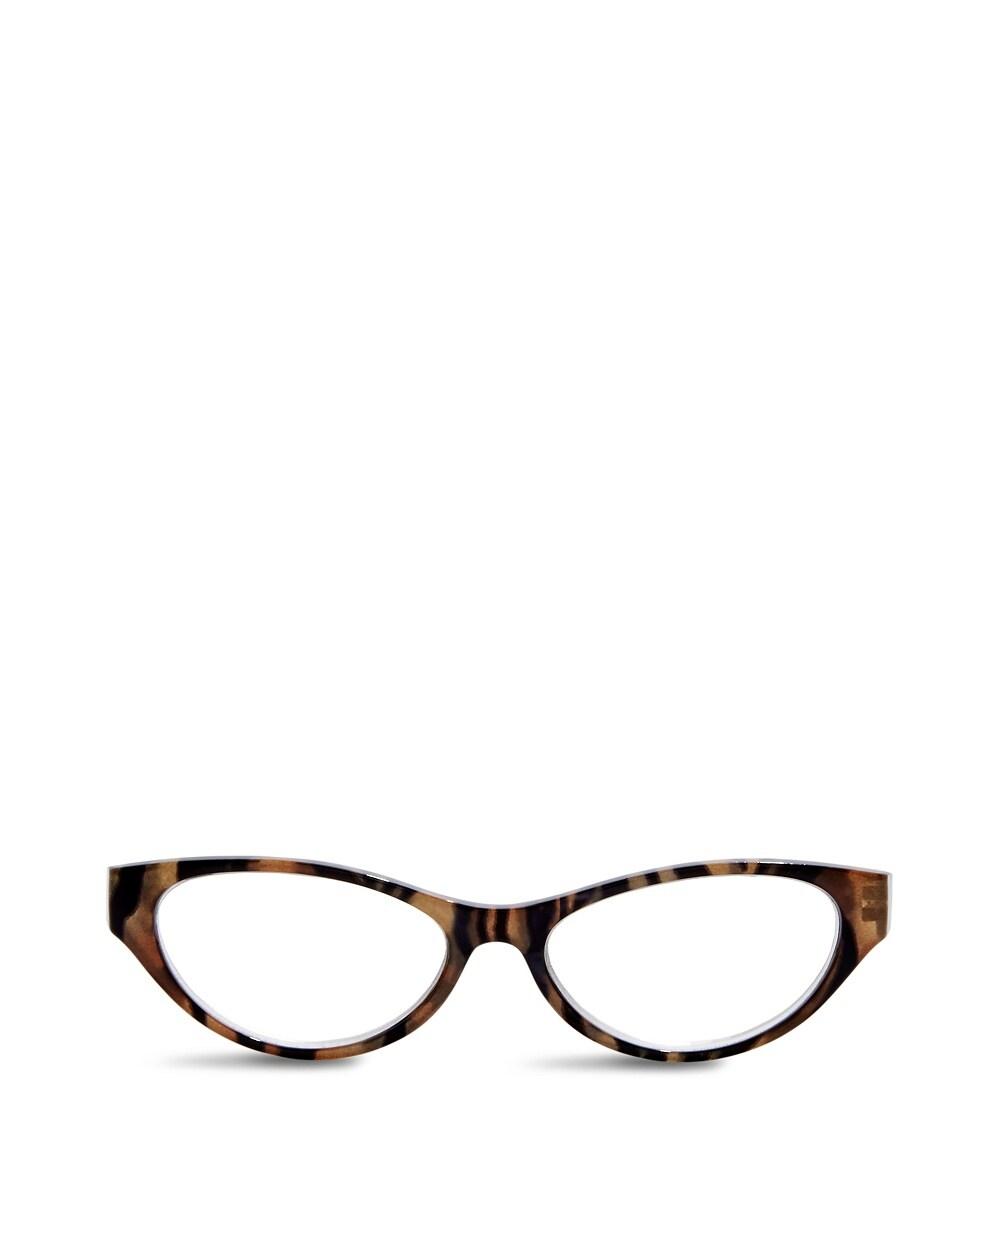 Eyeglass Frames Katy : Katy Kat Reader Glasses - Chicos